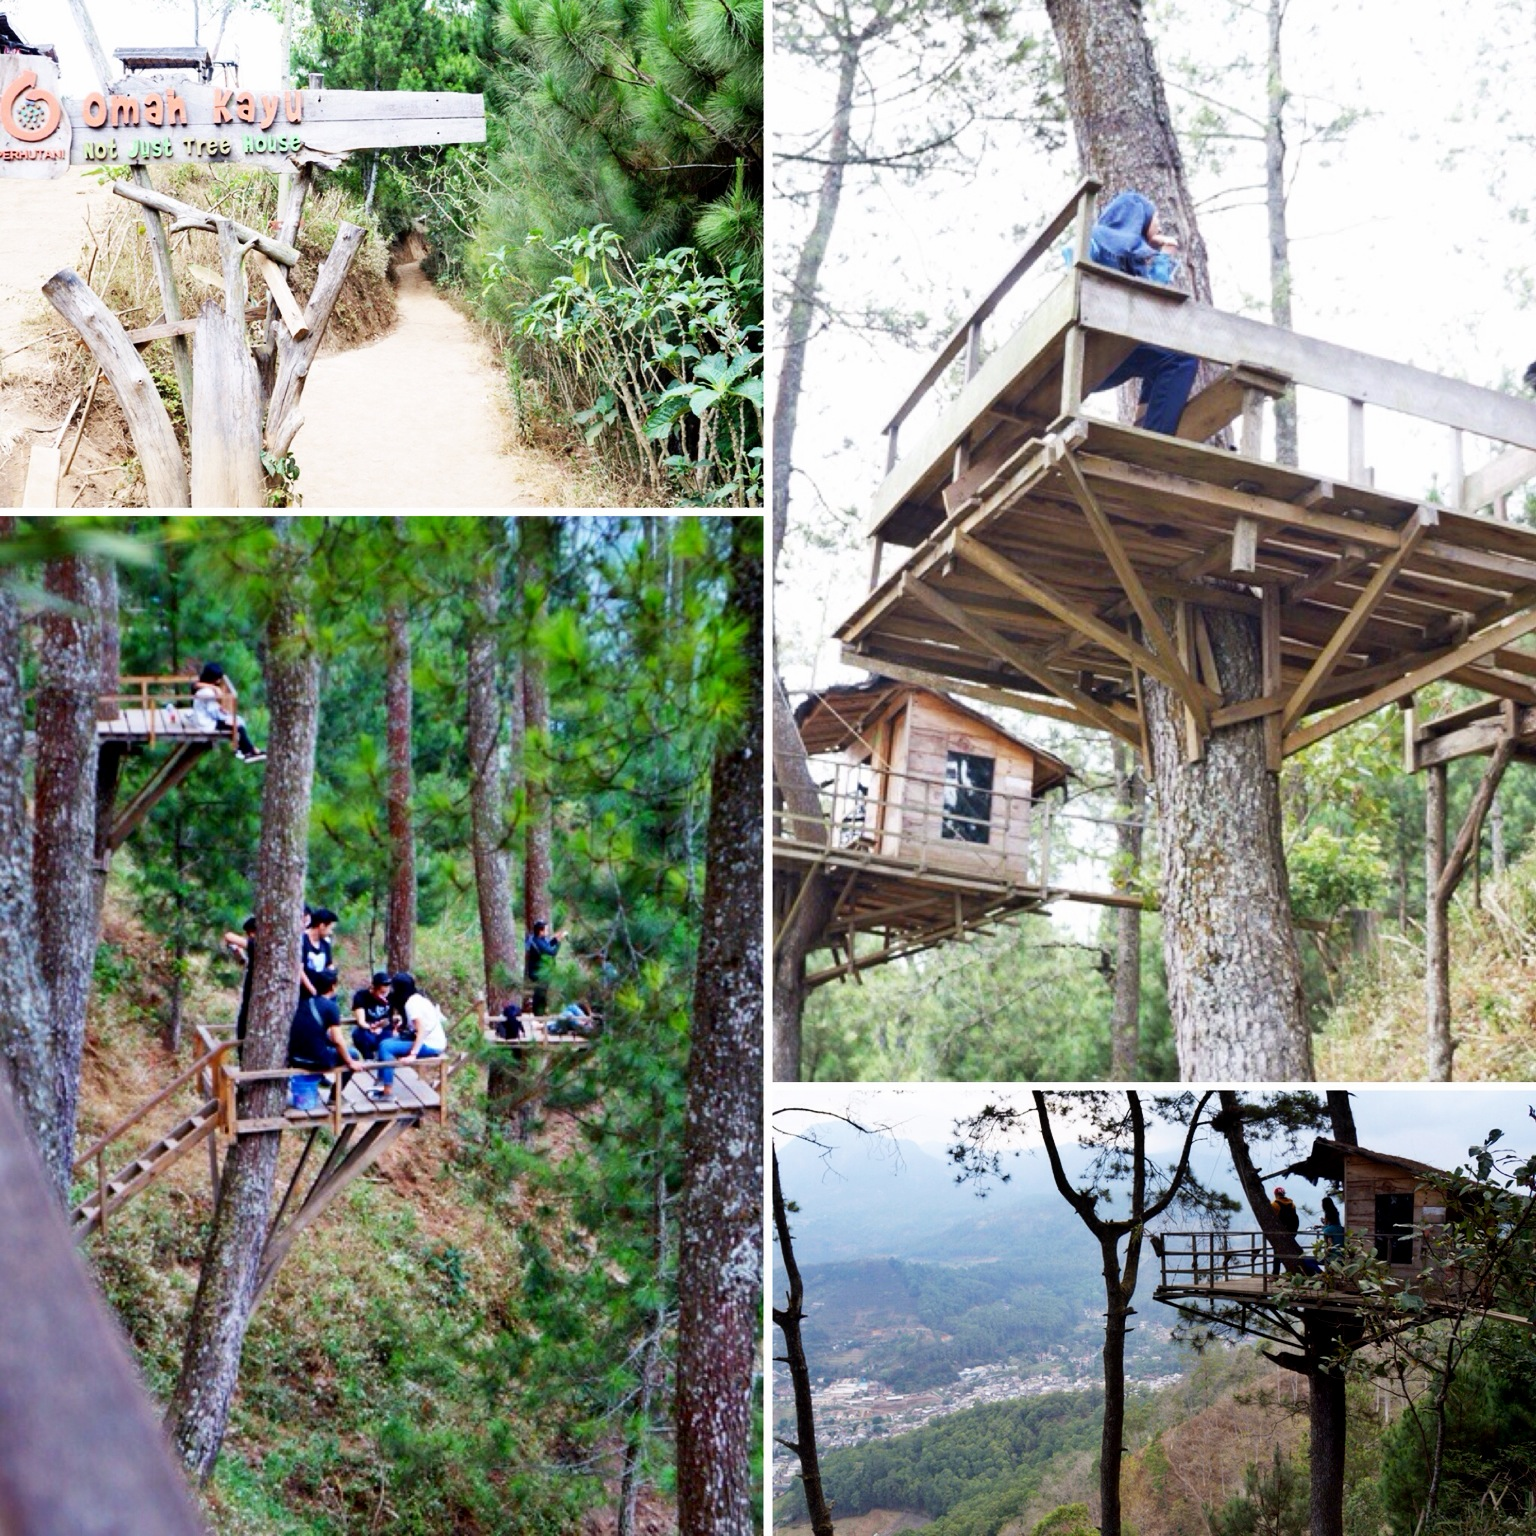 Salika Travel Wana Wisata Gunung Paralayang Omah Kayu Kota Batu